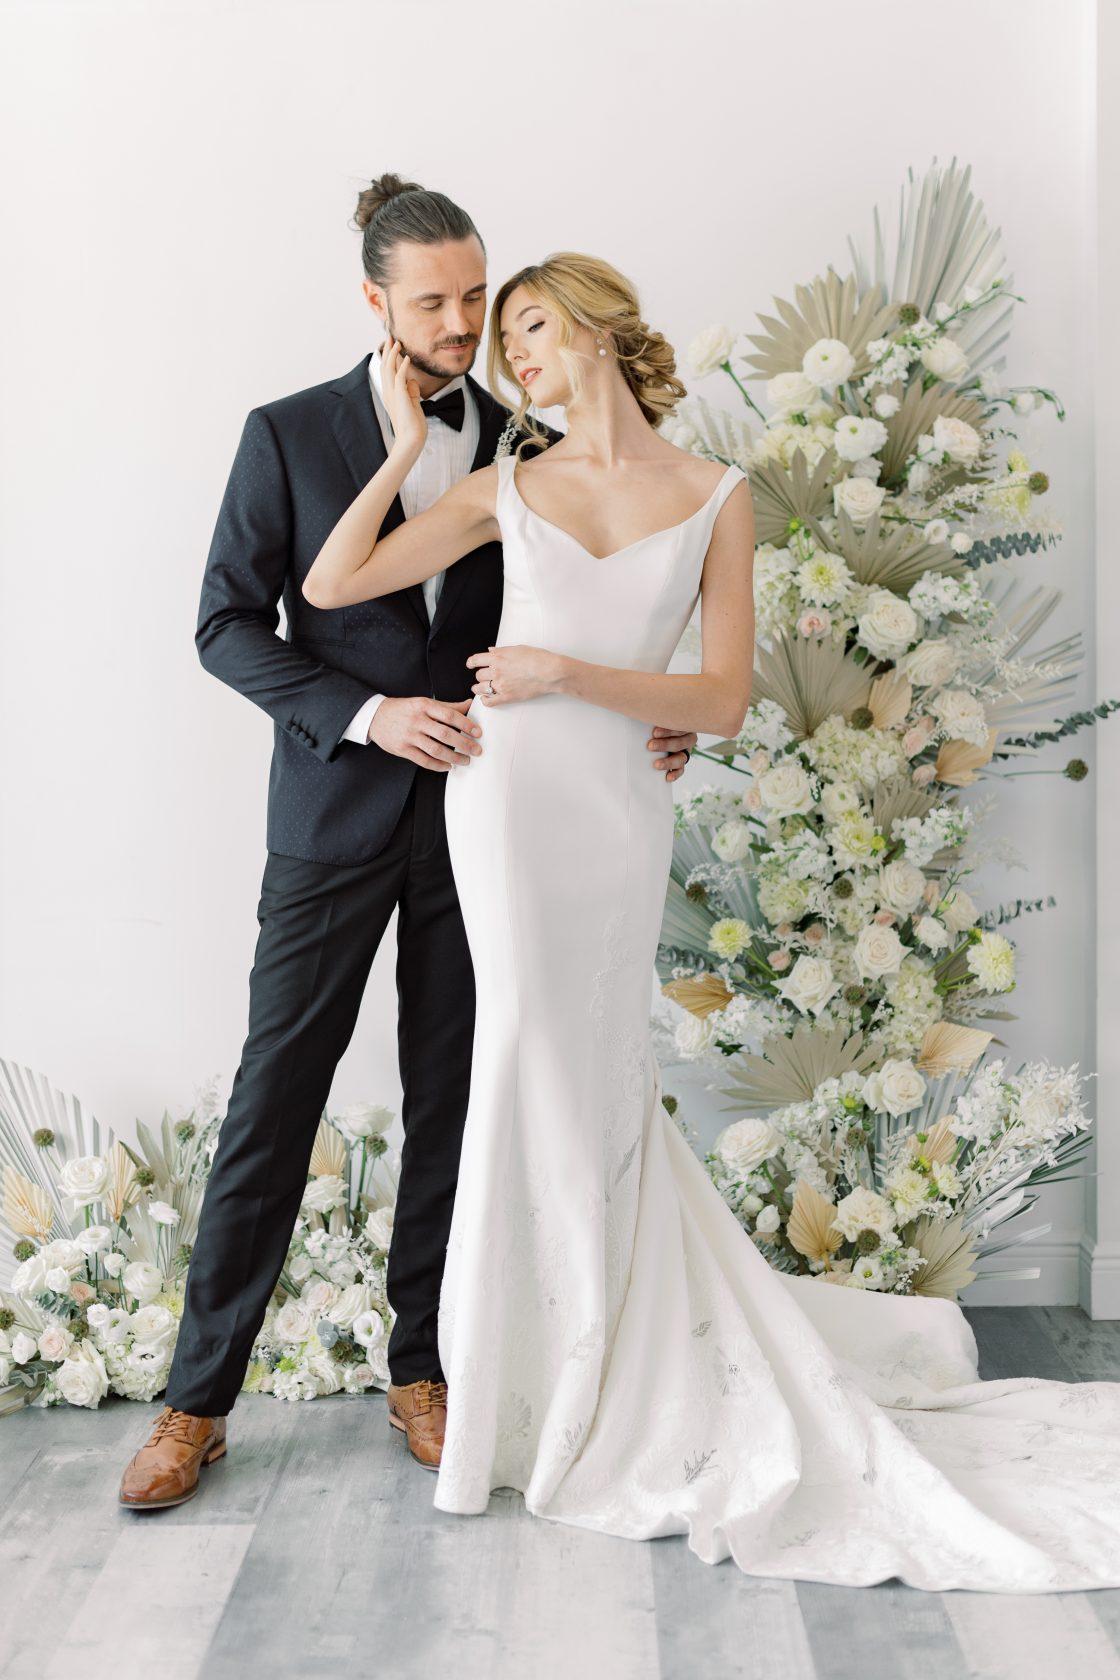 Elegant Bride and Groom with Man Bun